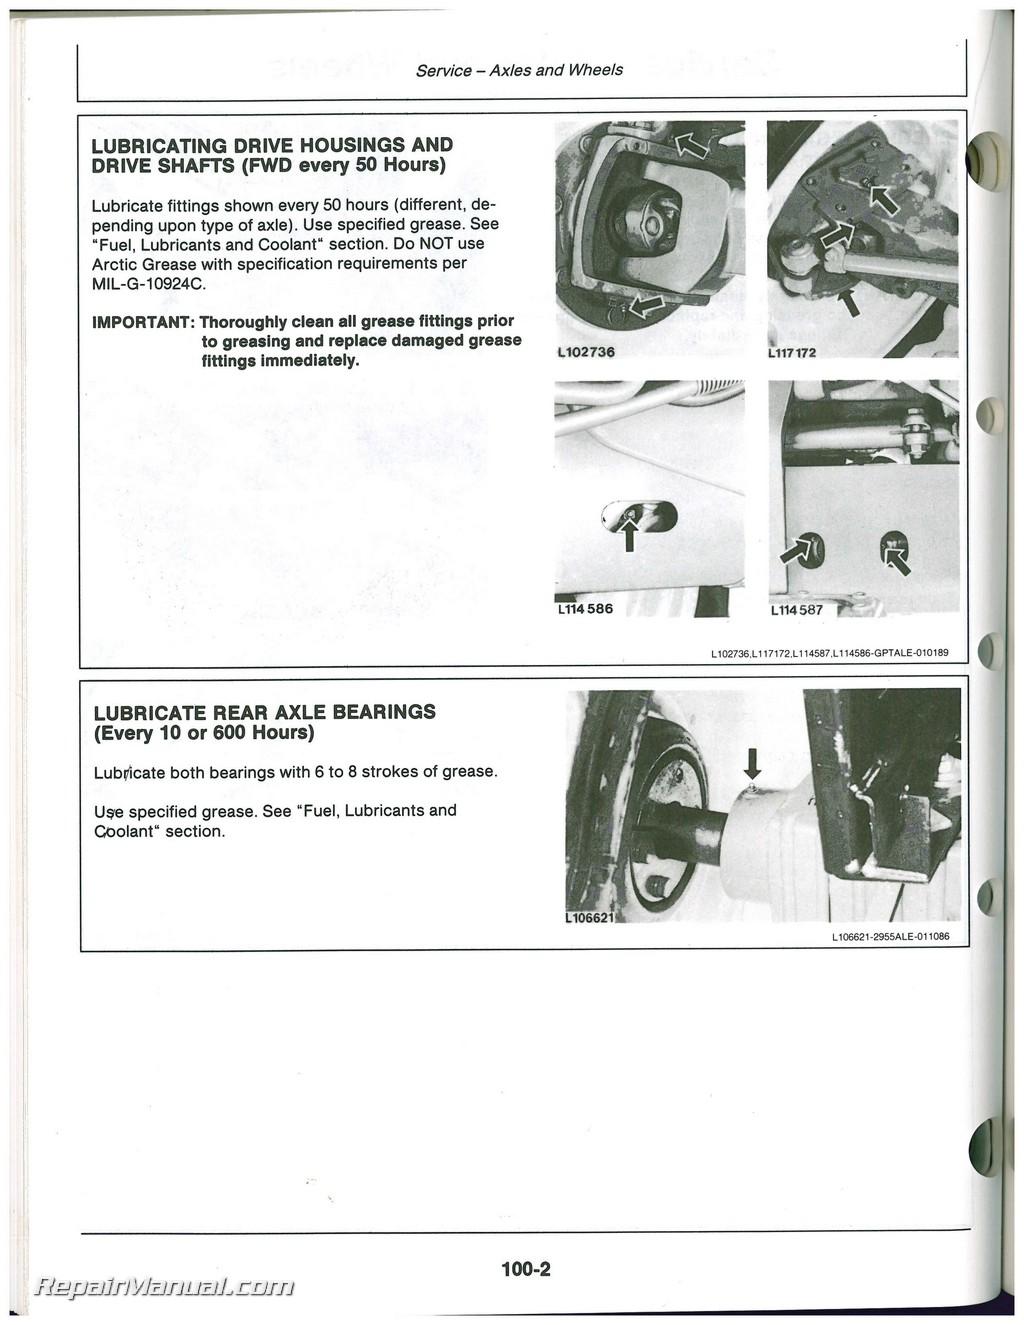 Used John Deere 2155, 2355 2555 and 2755 Tractors ...